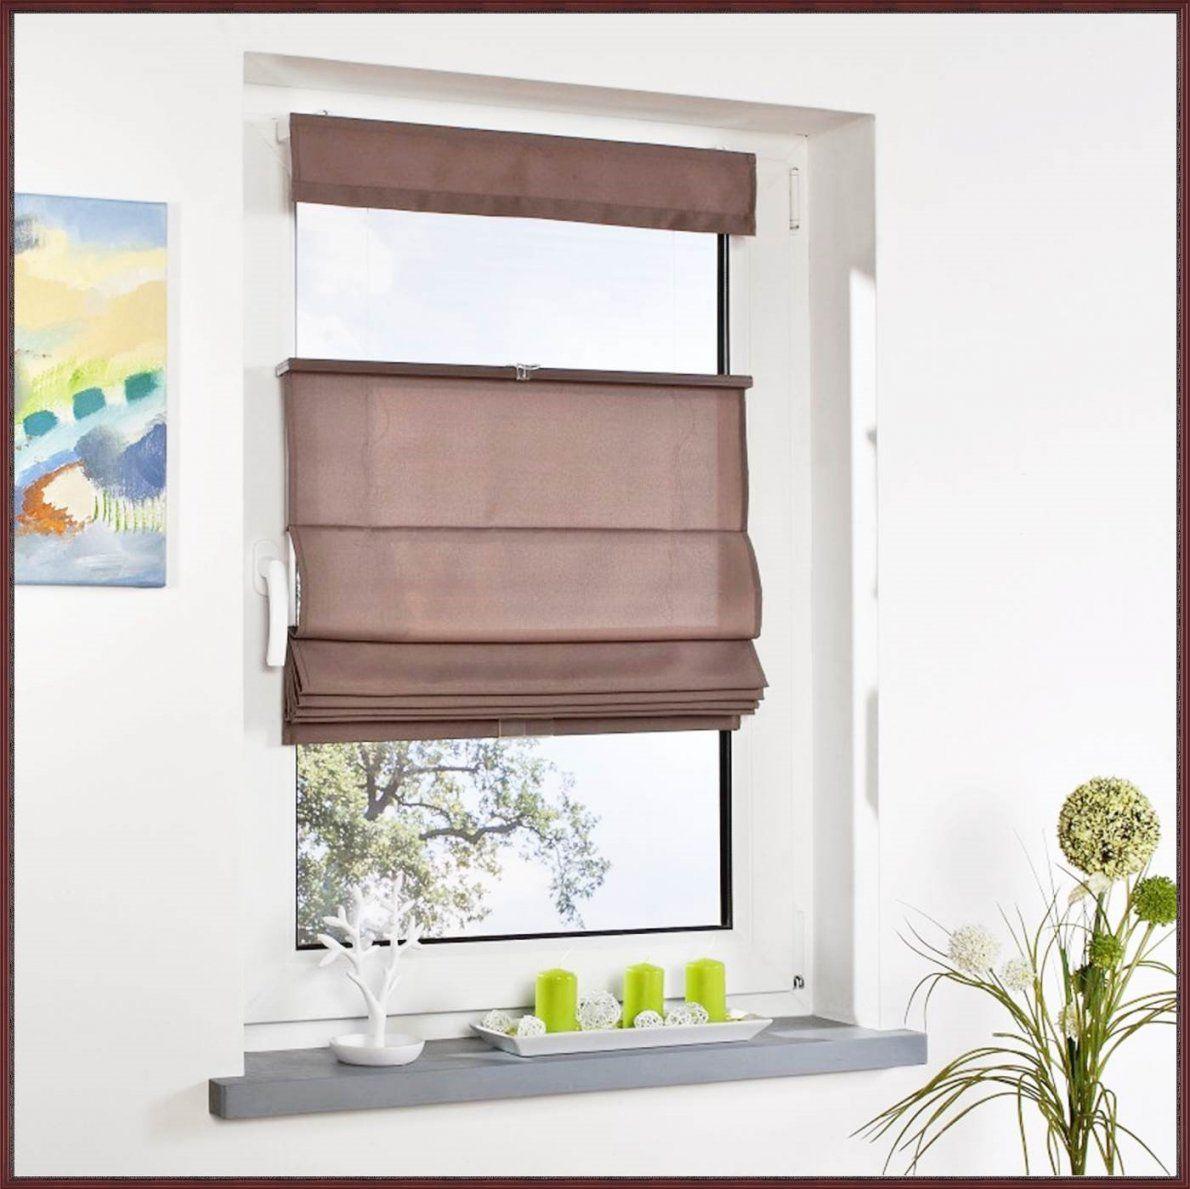 sch nes gardinen ohne bohren aufh ngen andere gardinen. Black Bedroom Furniture Sets. Home Design Ideas